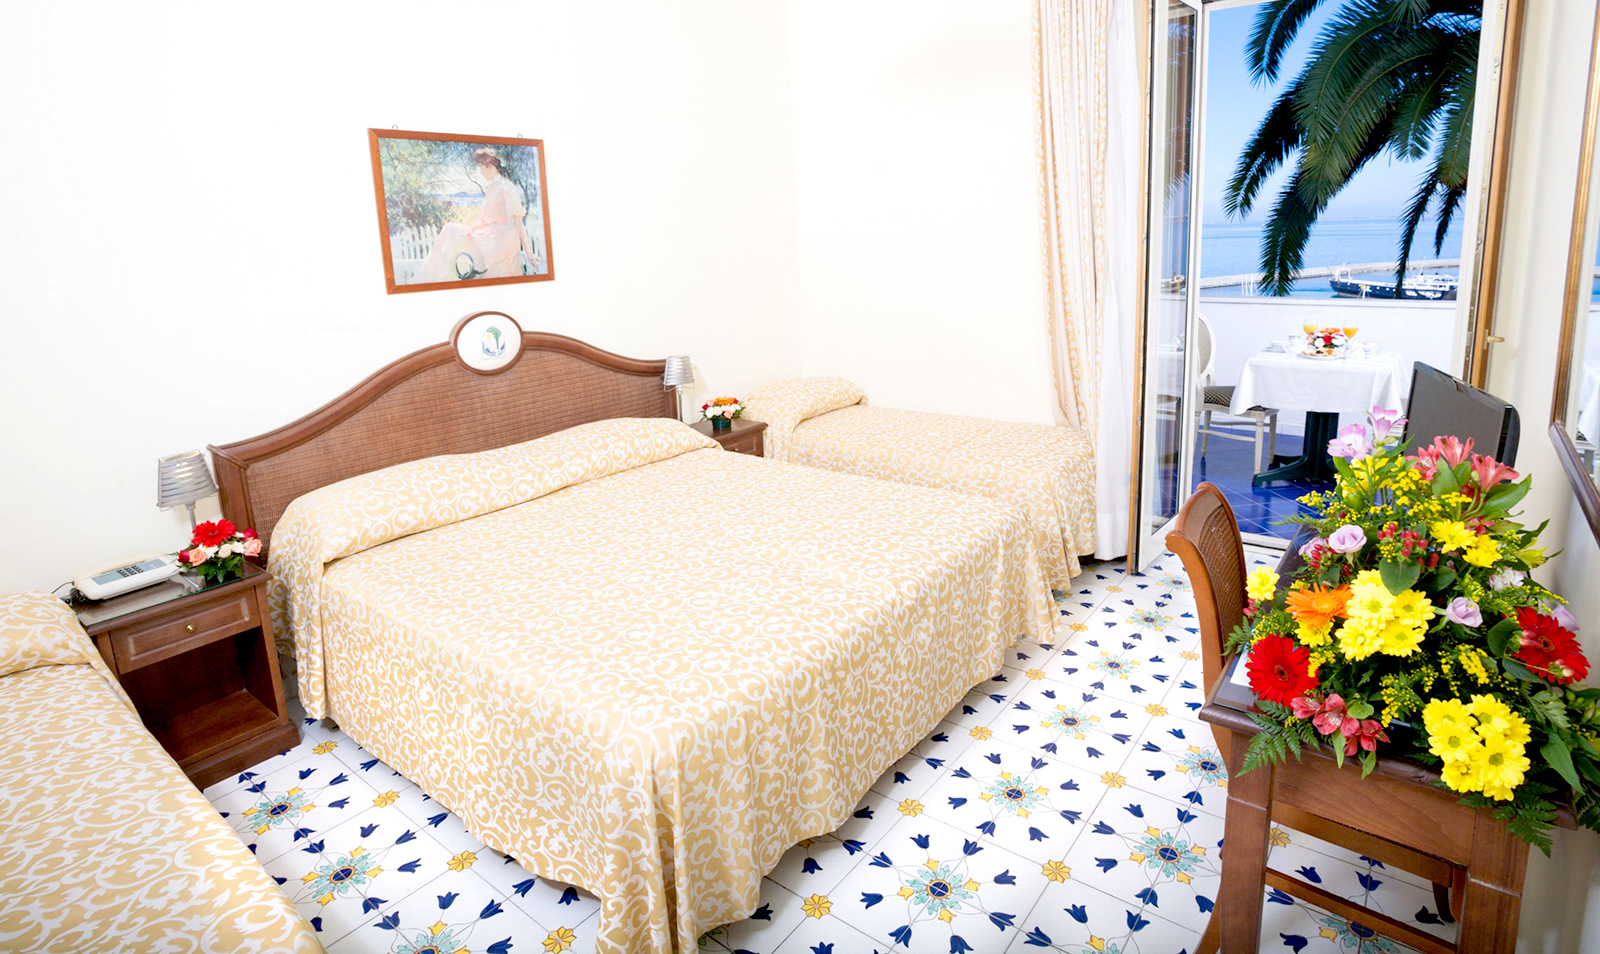 hotel-terme-gran-paradiso-ischia-casamicciola-camera-comfort